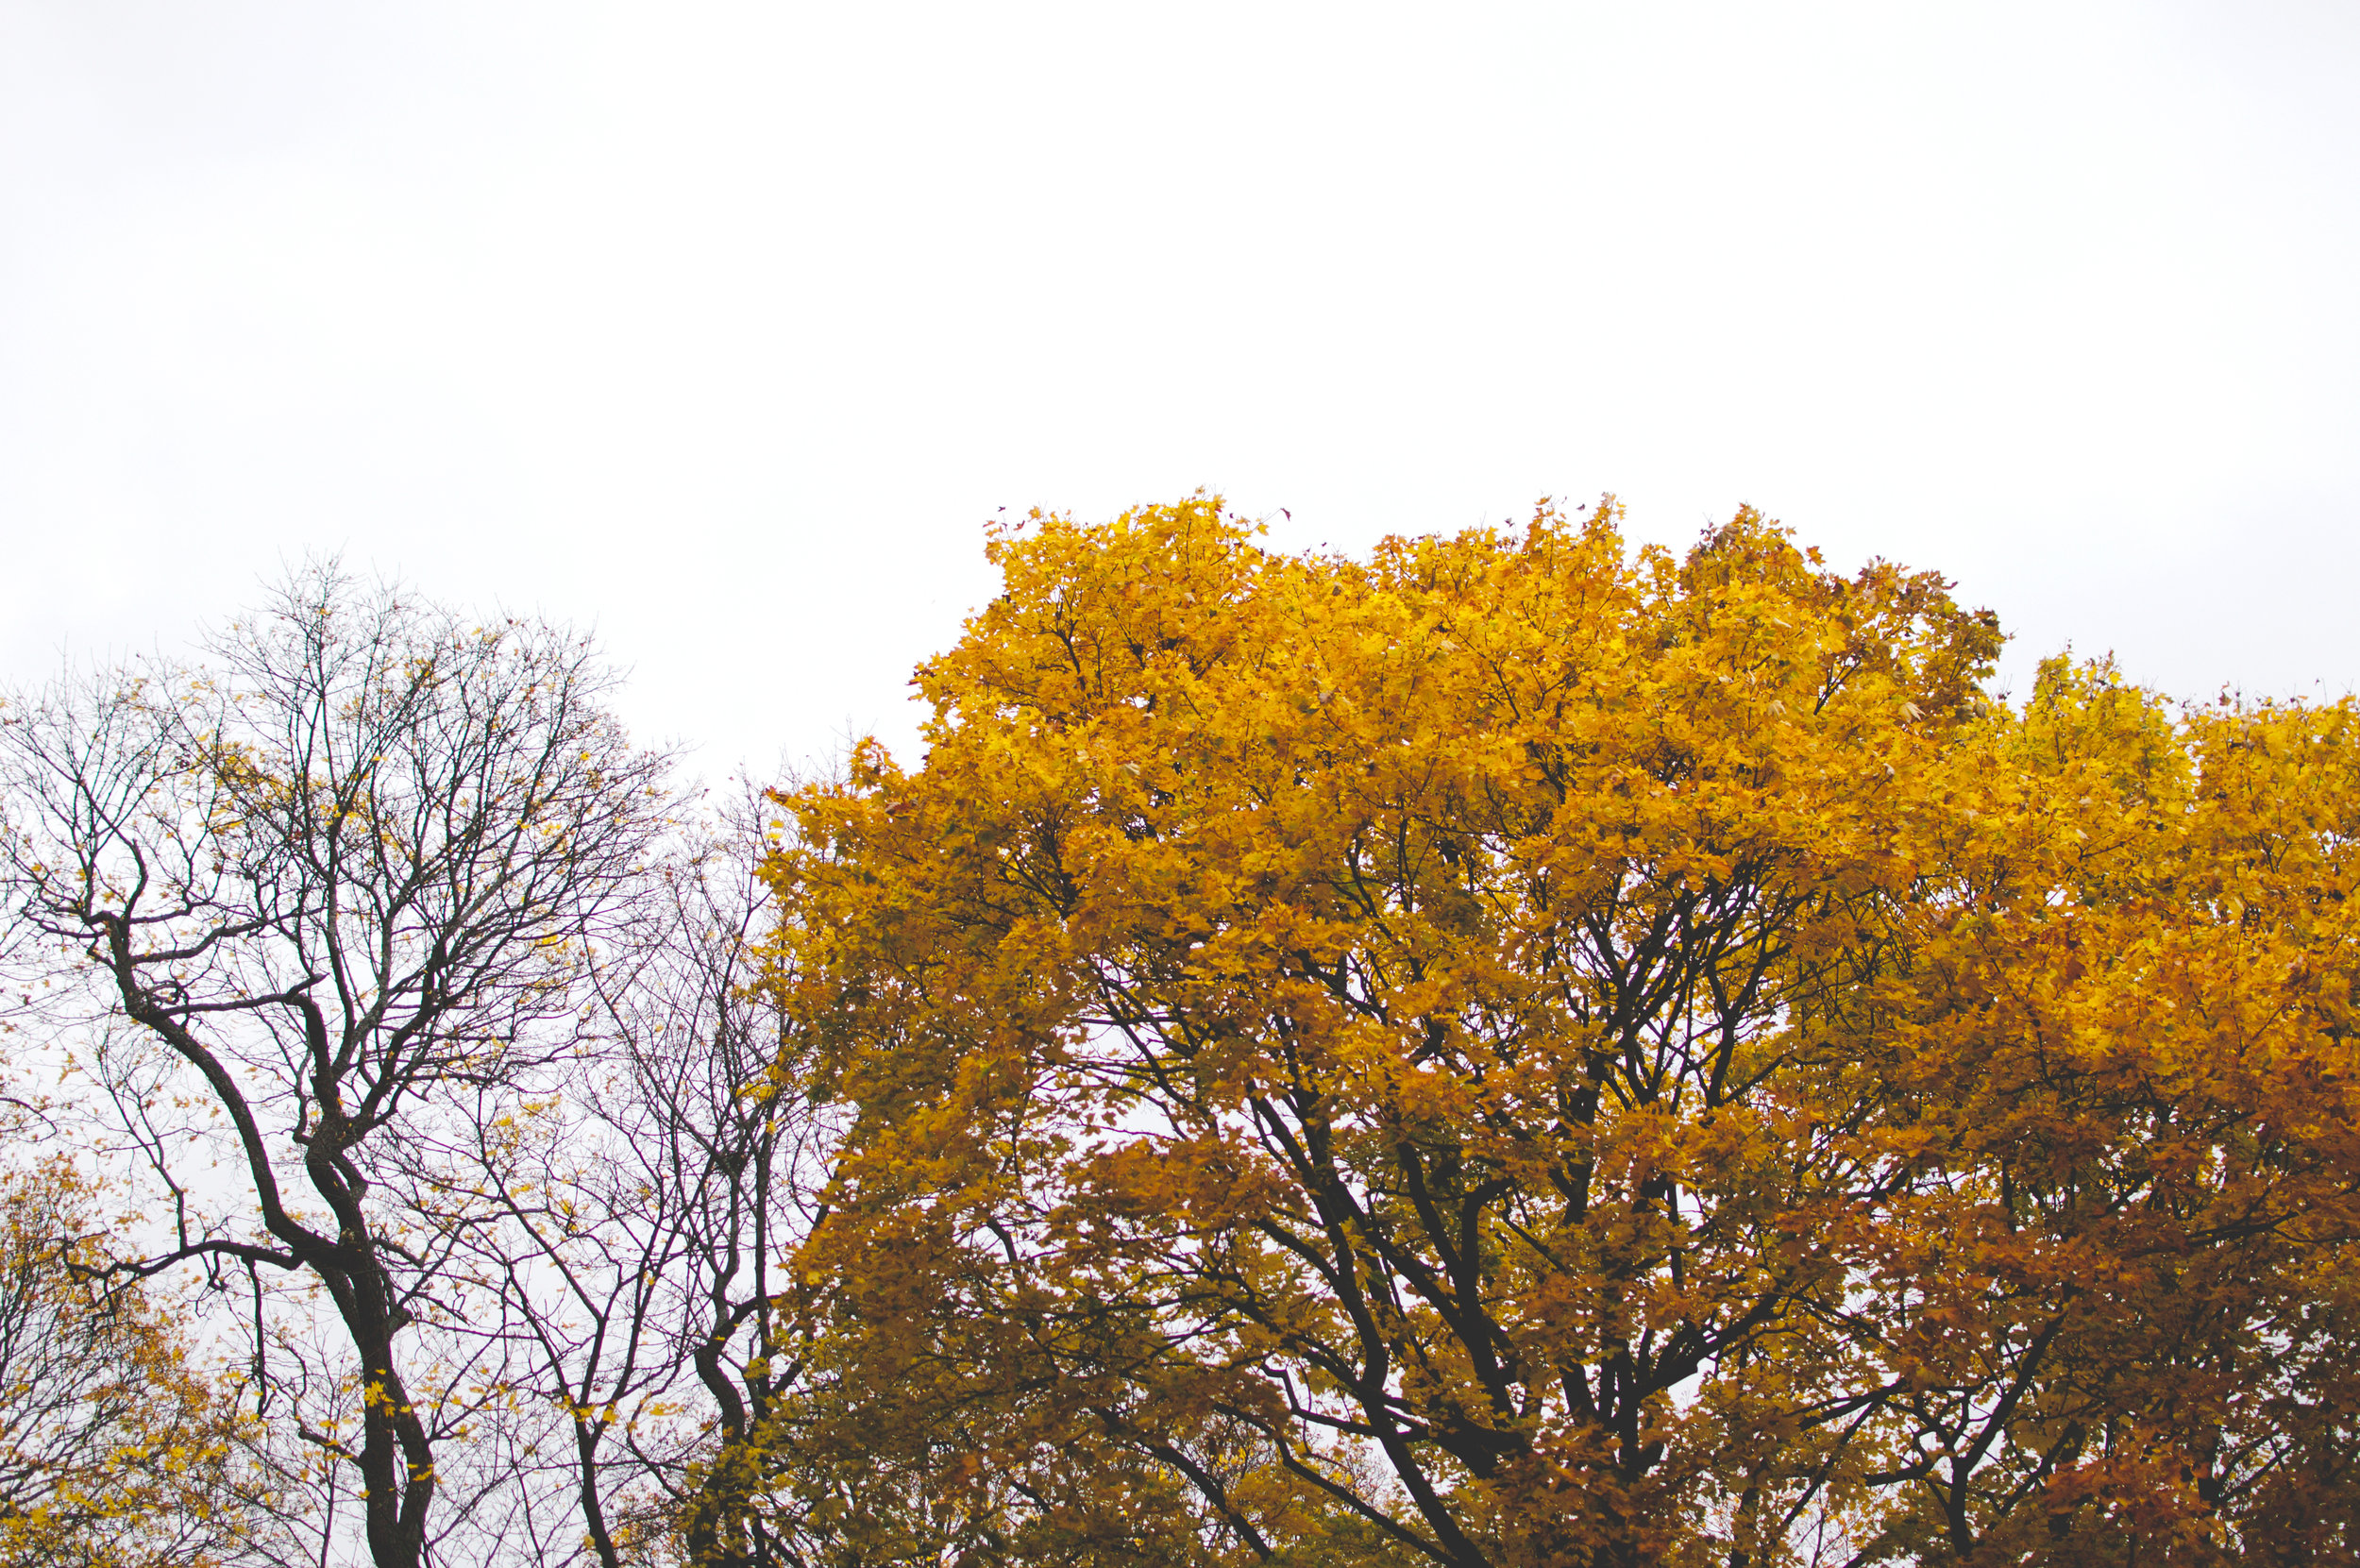 marta-vargas-autumn-stockholm-4375.jpg